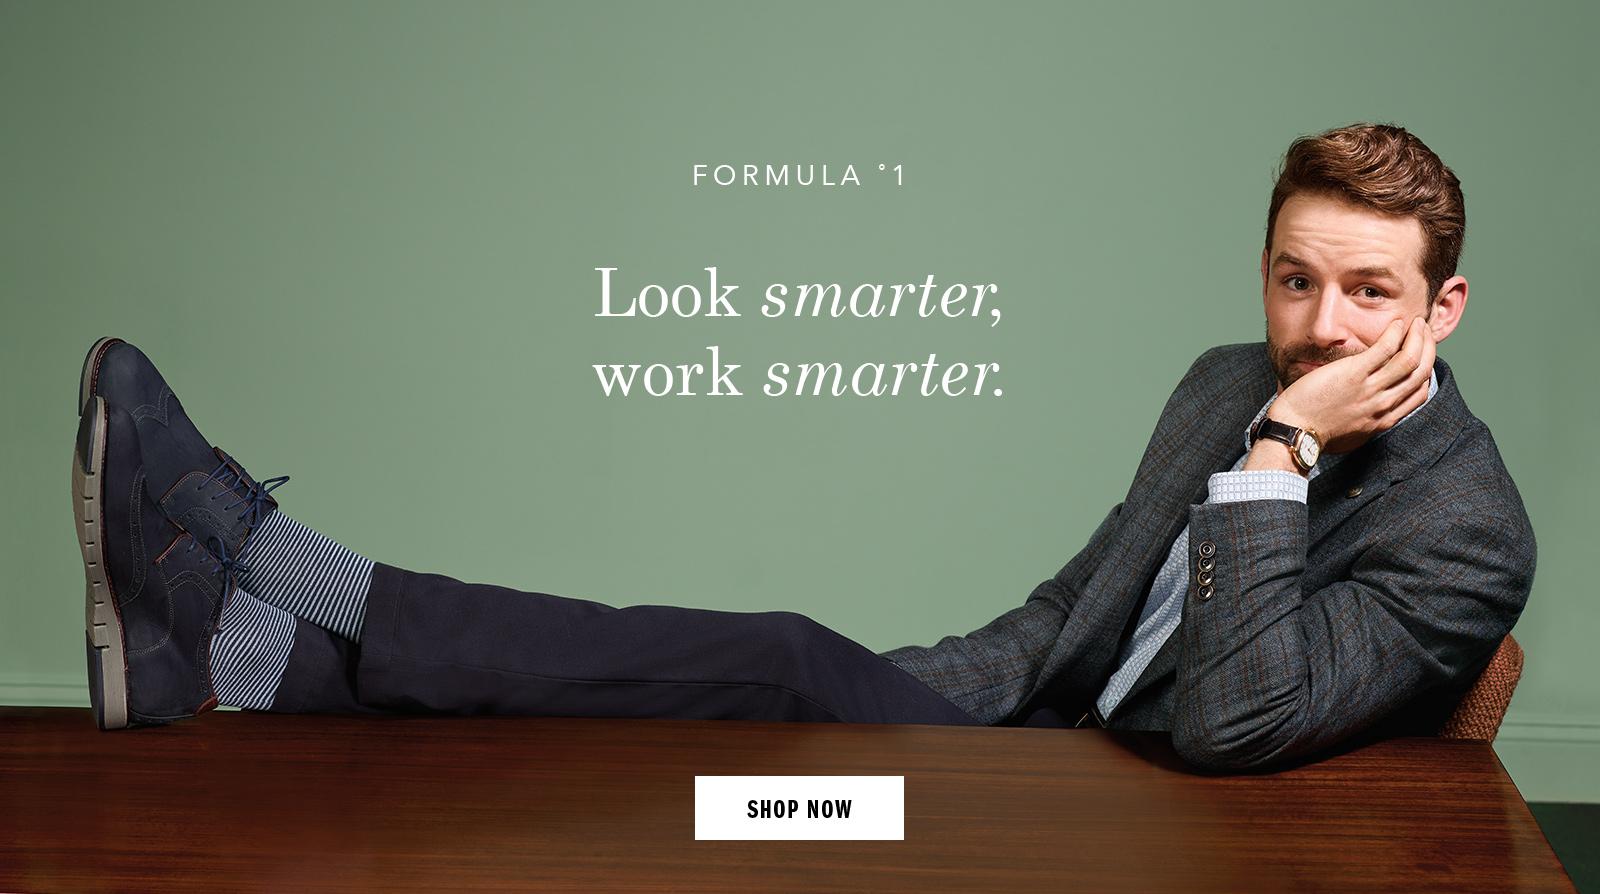 Look smarter work smarter  Shop Men's Shoes and Apparel